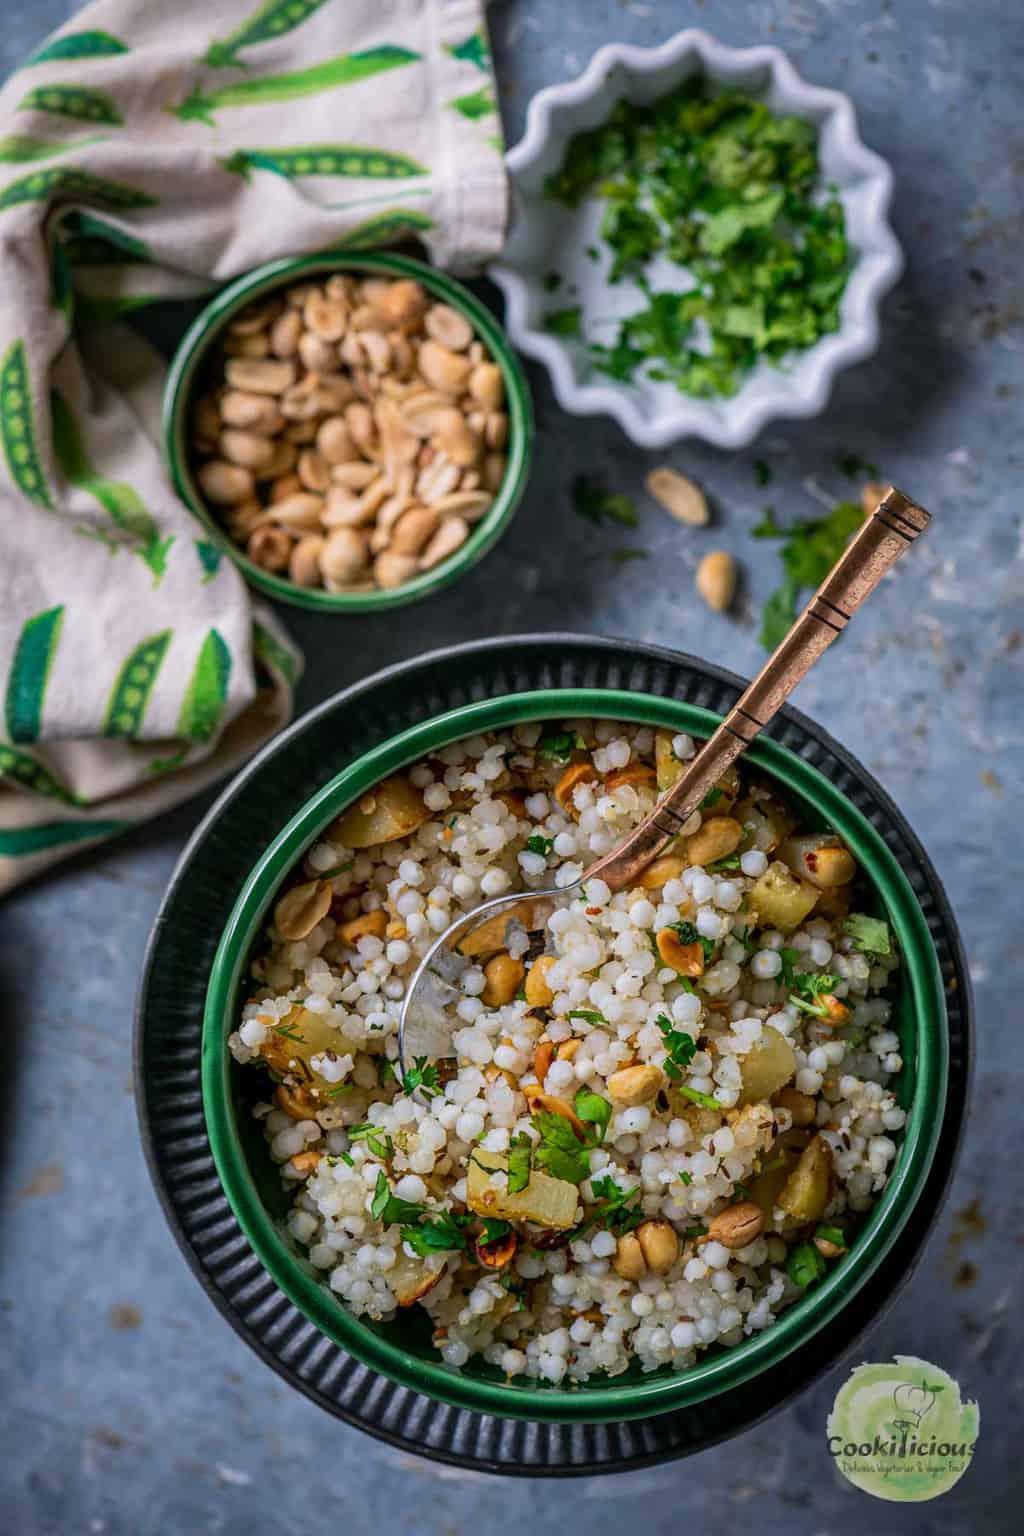 Sabudana Khichdi served next to a bowl of peanuts and cilantro